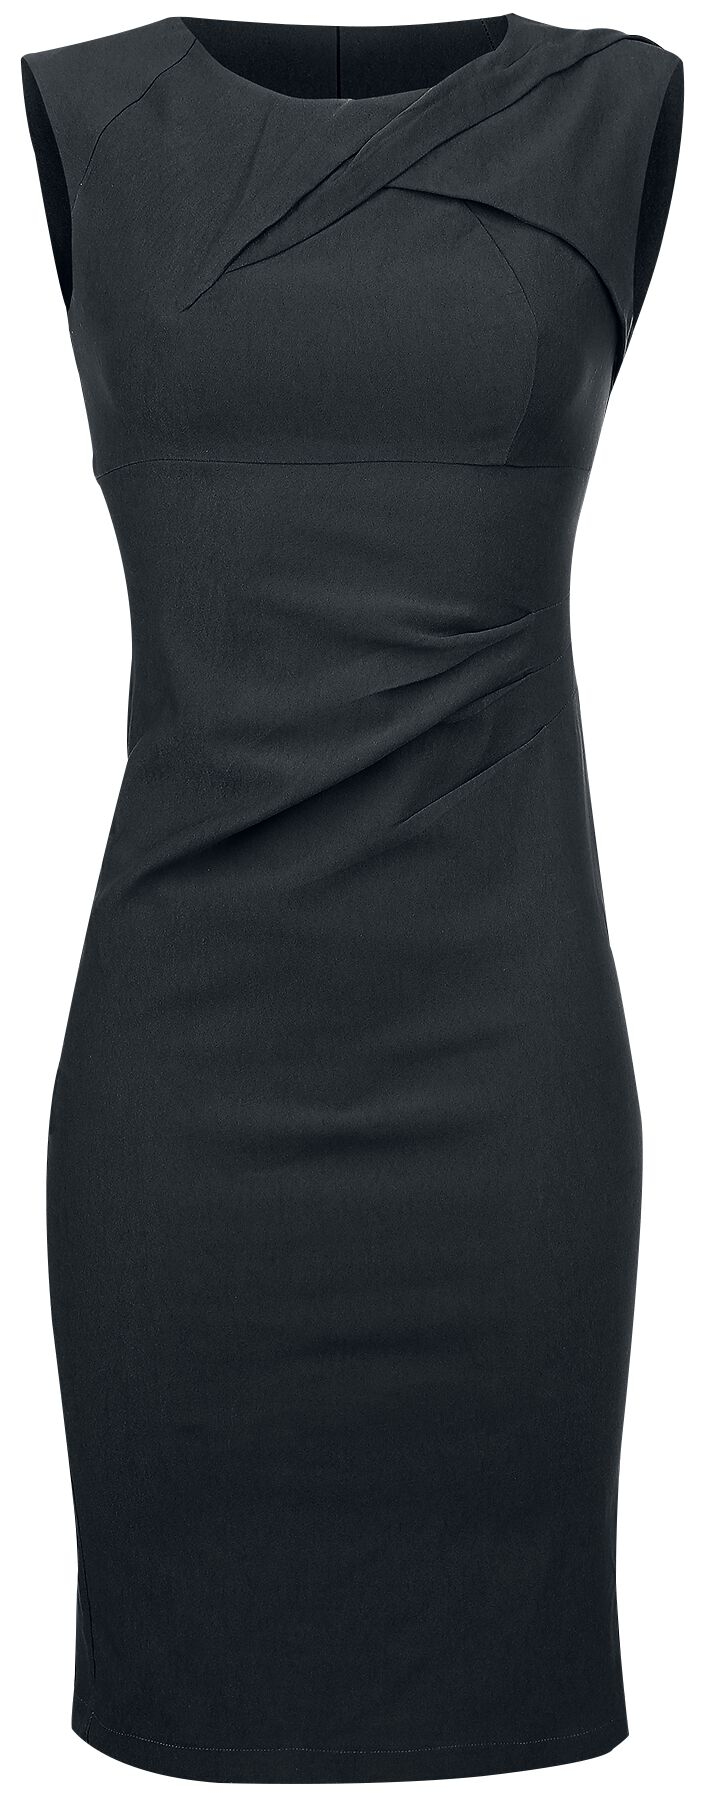 Voodoo Vixen Claudette Sukienka czarny